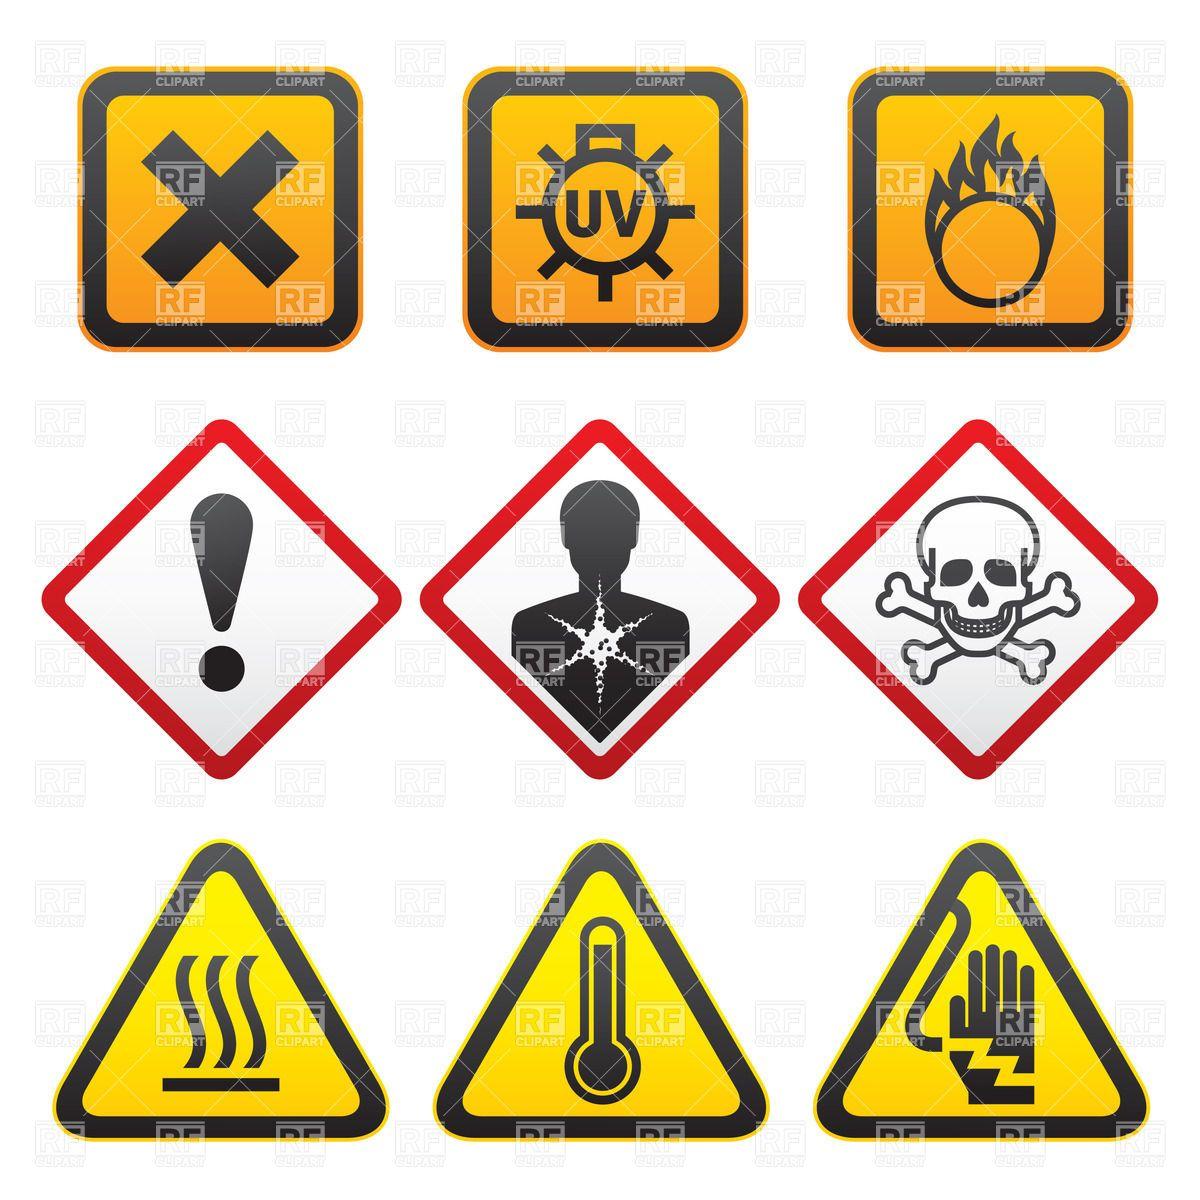 Warning symbols hazard warning symbols sample 3 warning warning symbols and hazard signs royalty free vector clip art image rfclipart biocorpaavc